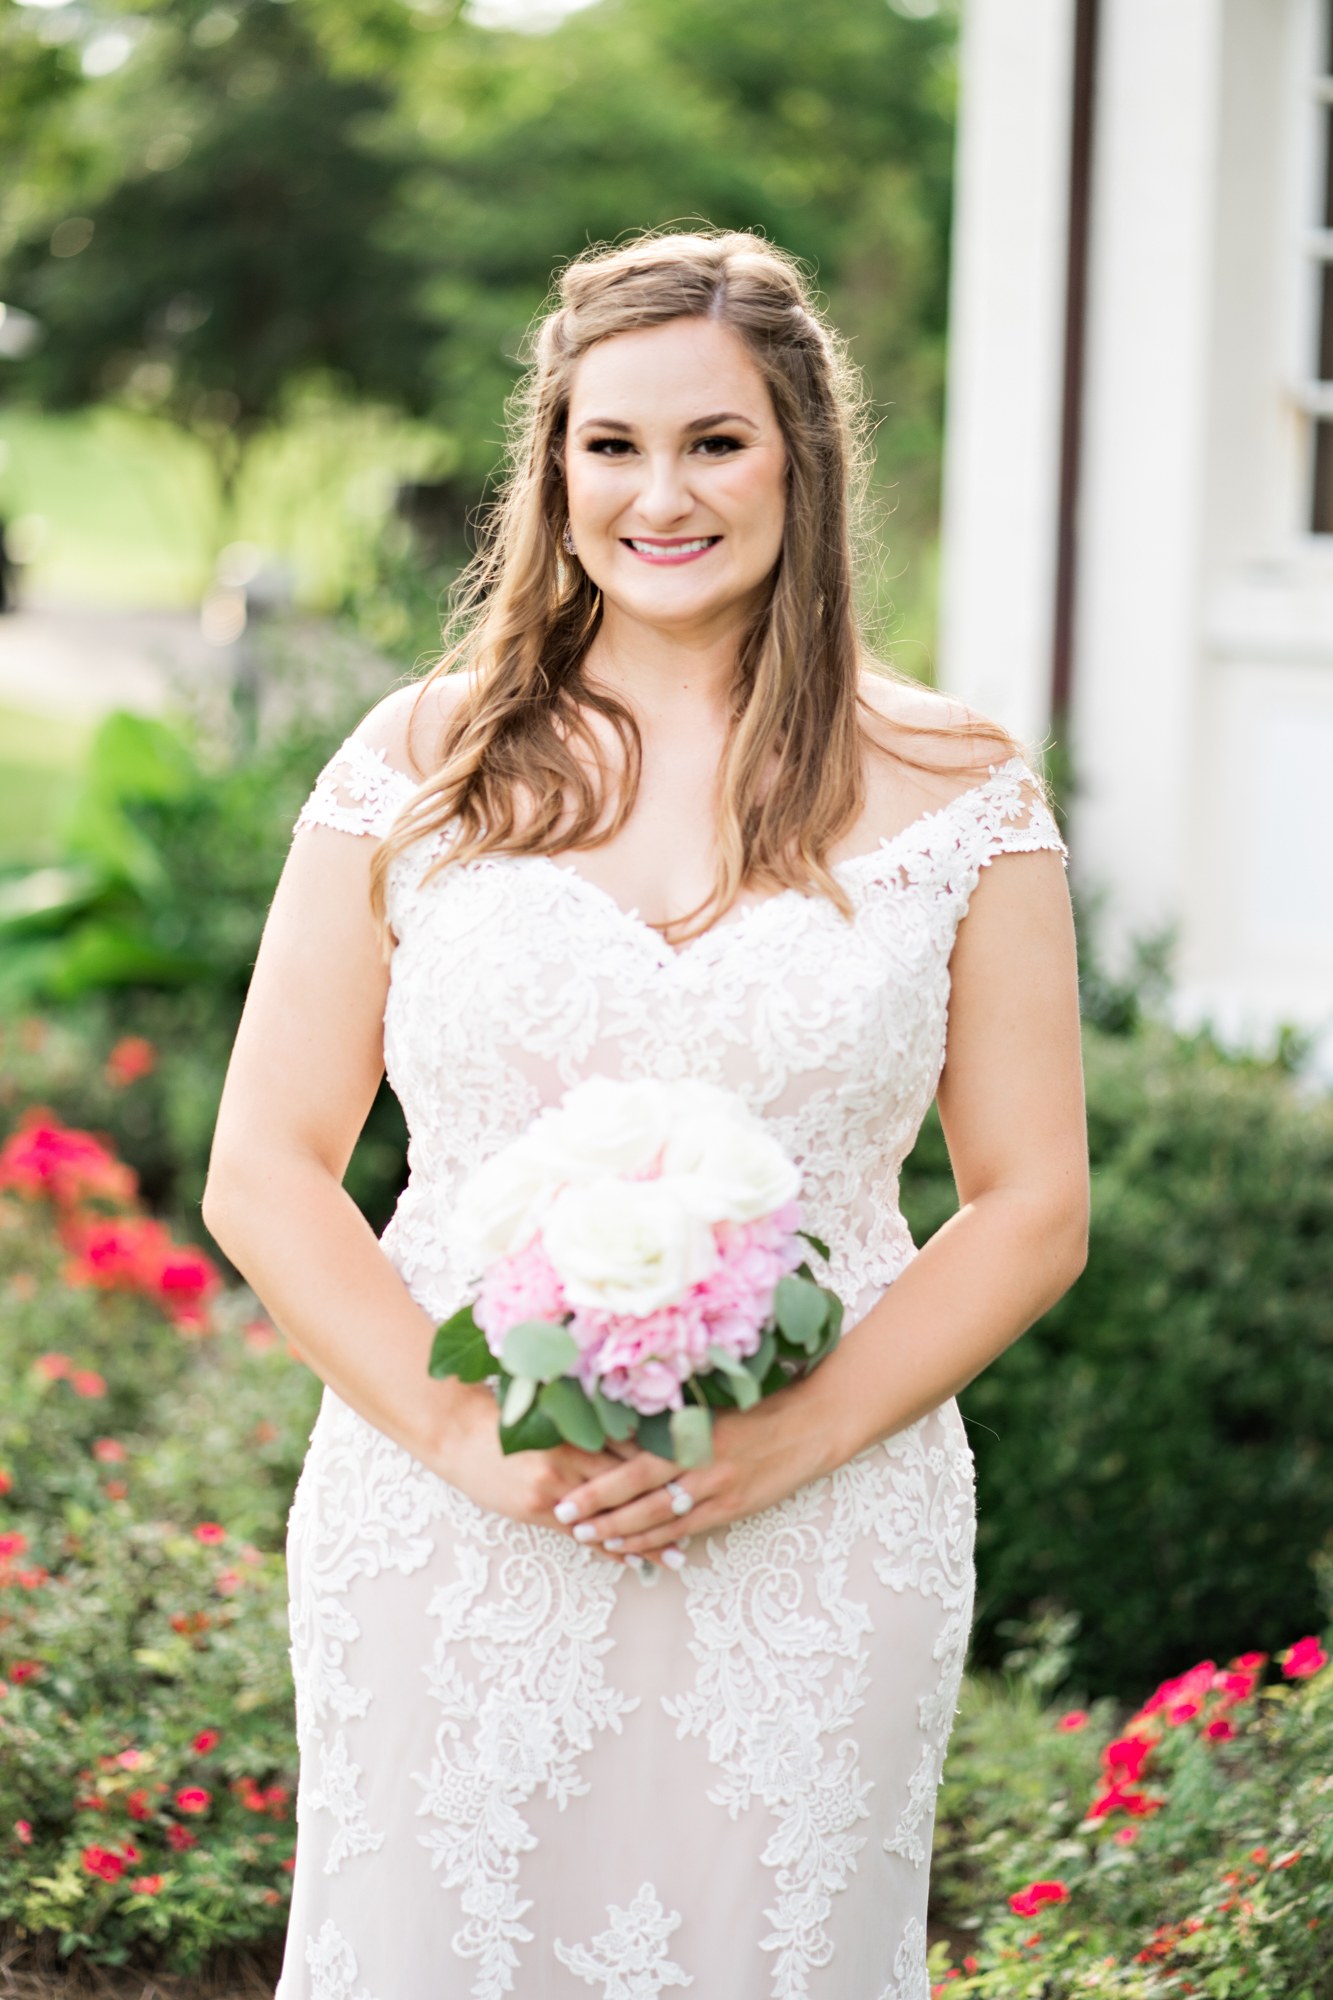 Alabama-Wedding-Photographer-Nick-Drollette-143.jpg